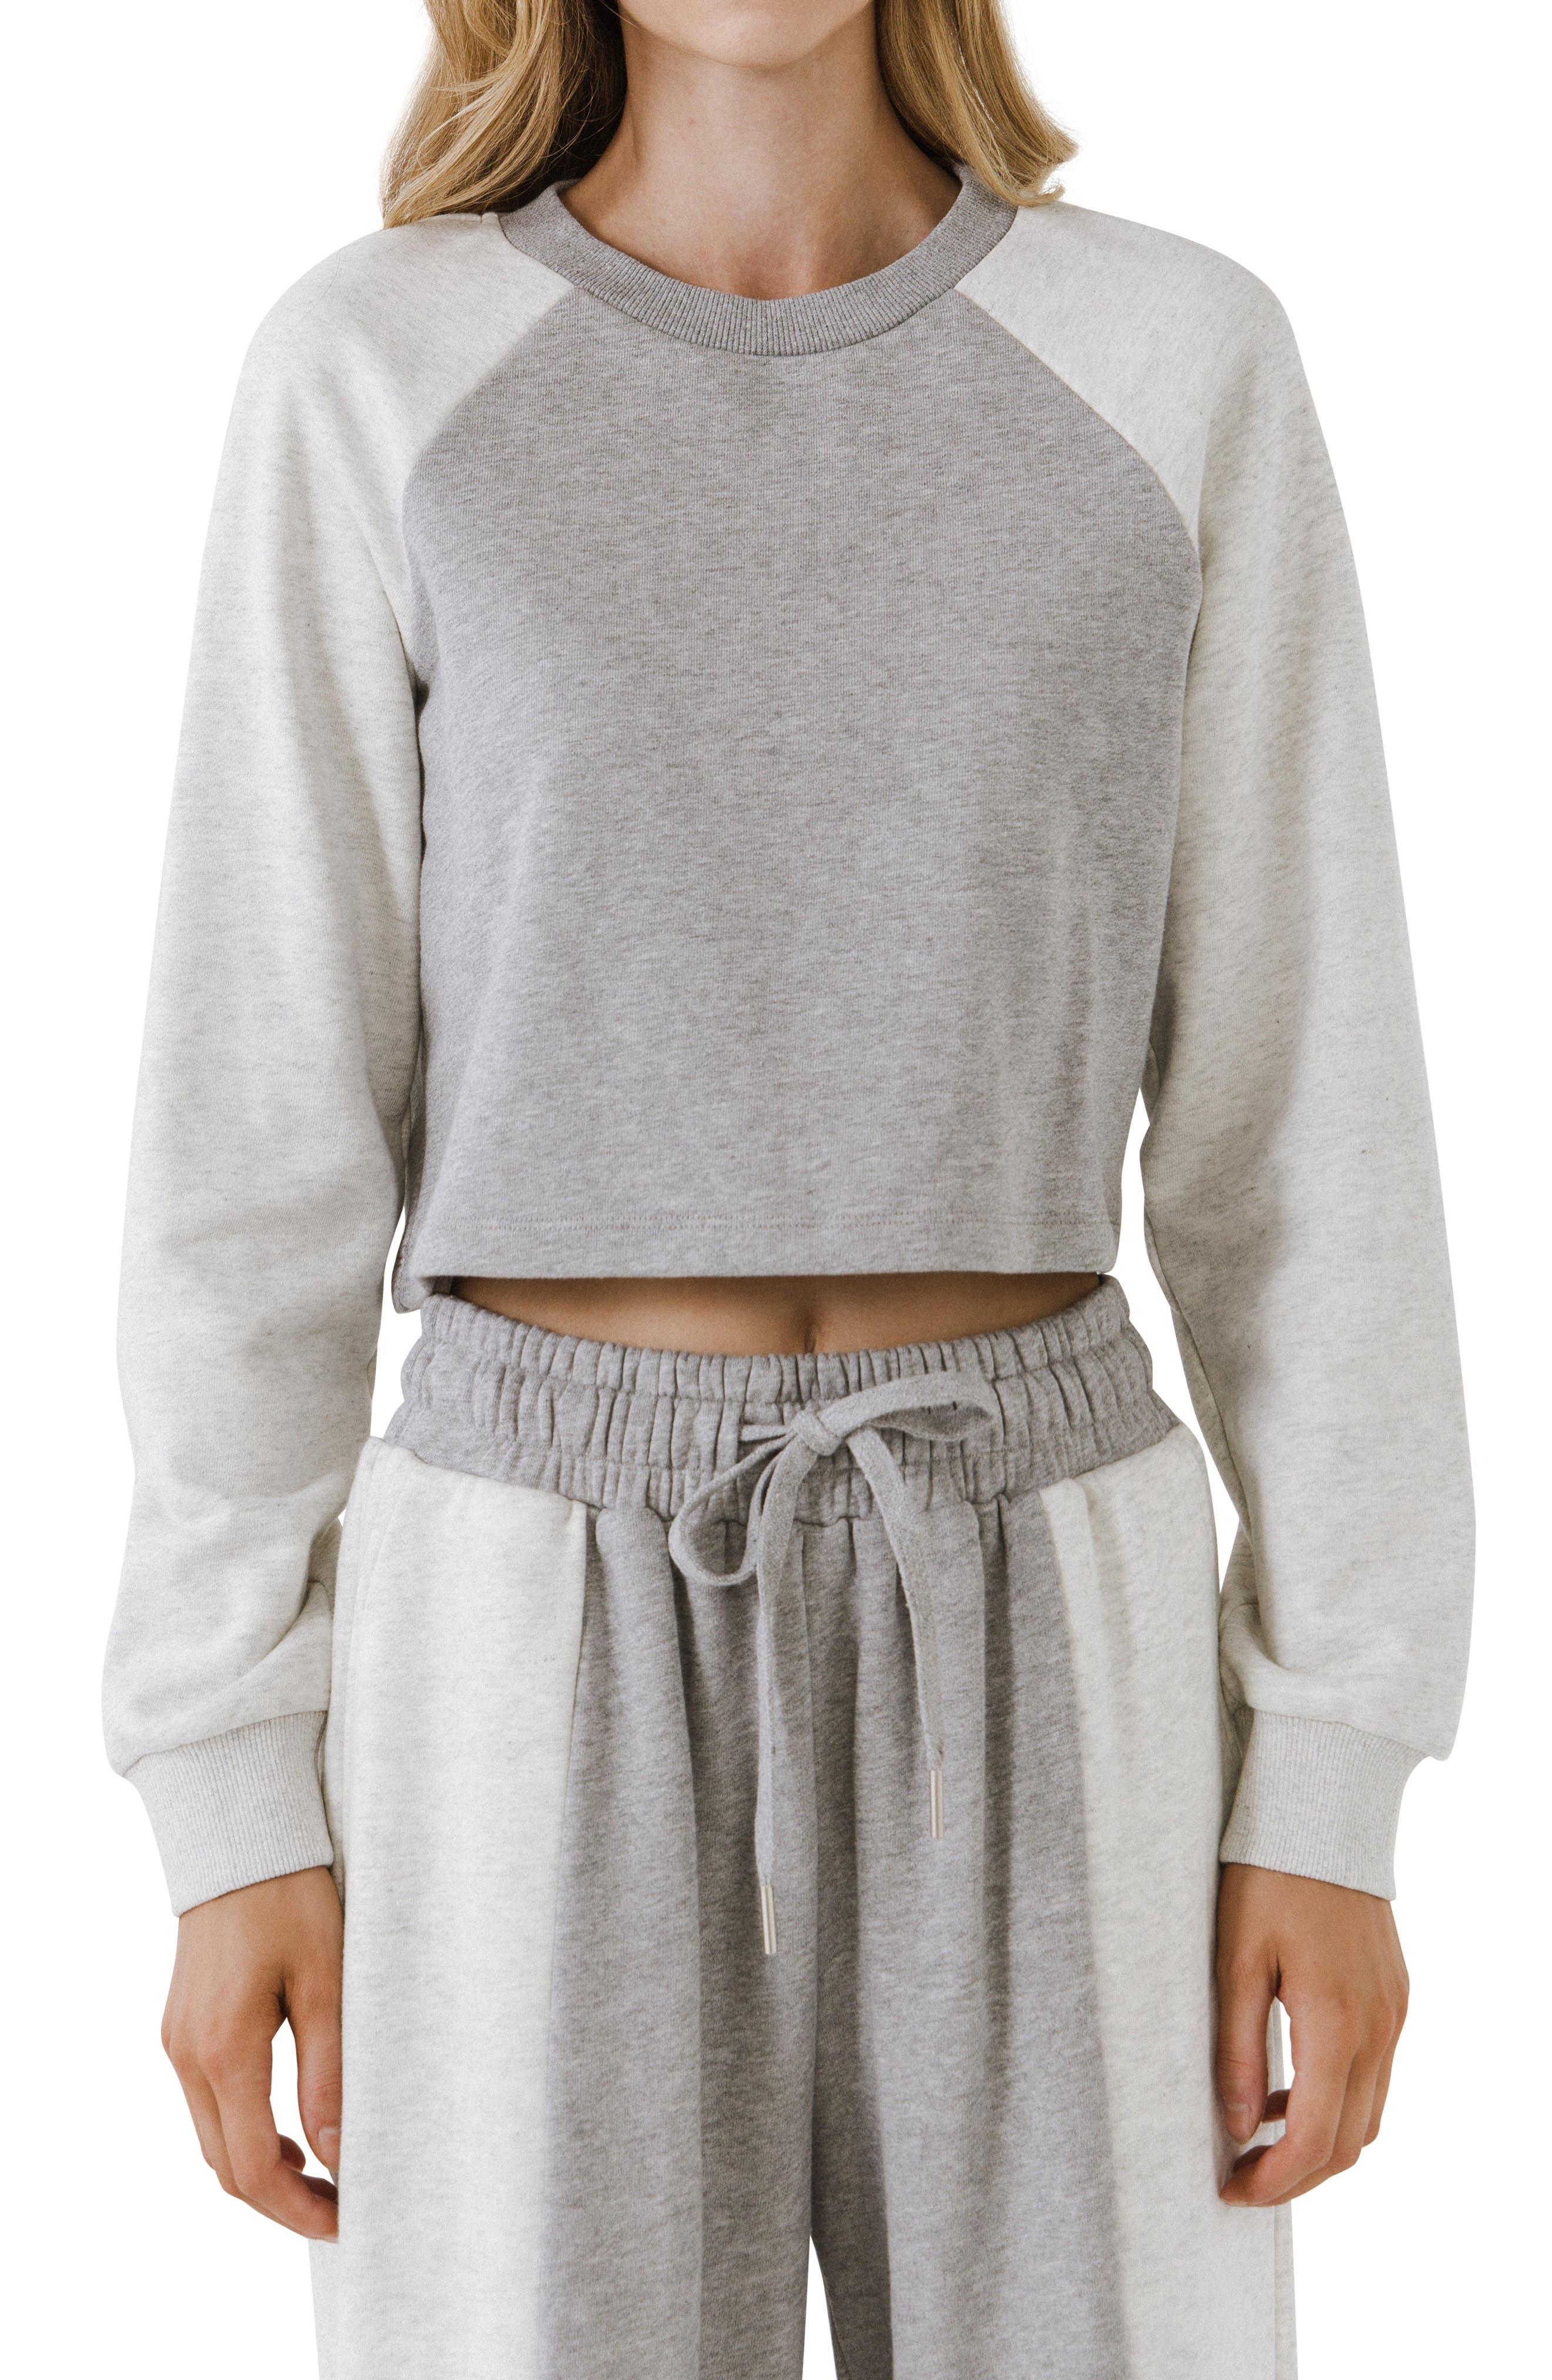 Colorblock Loungewear Top